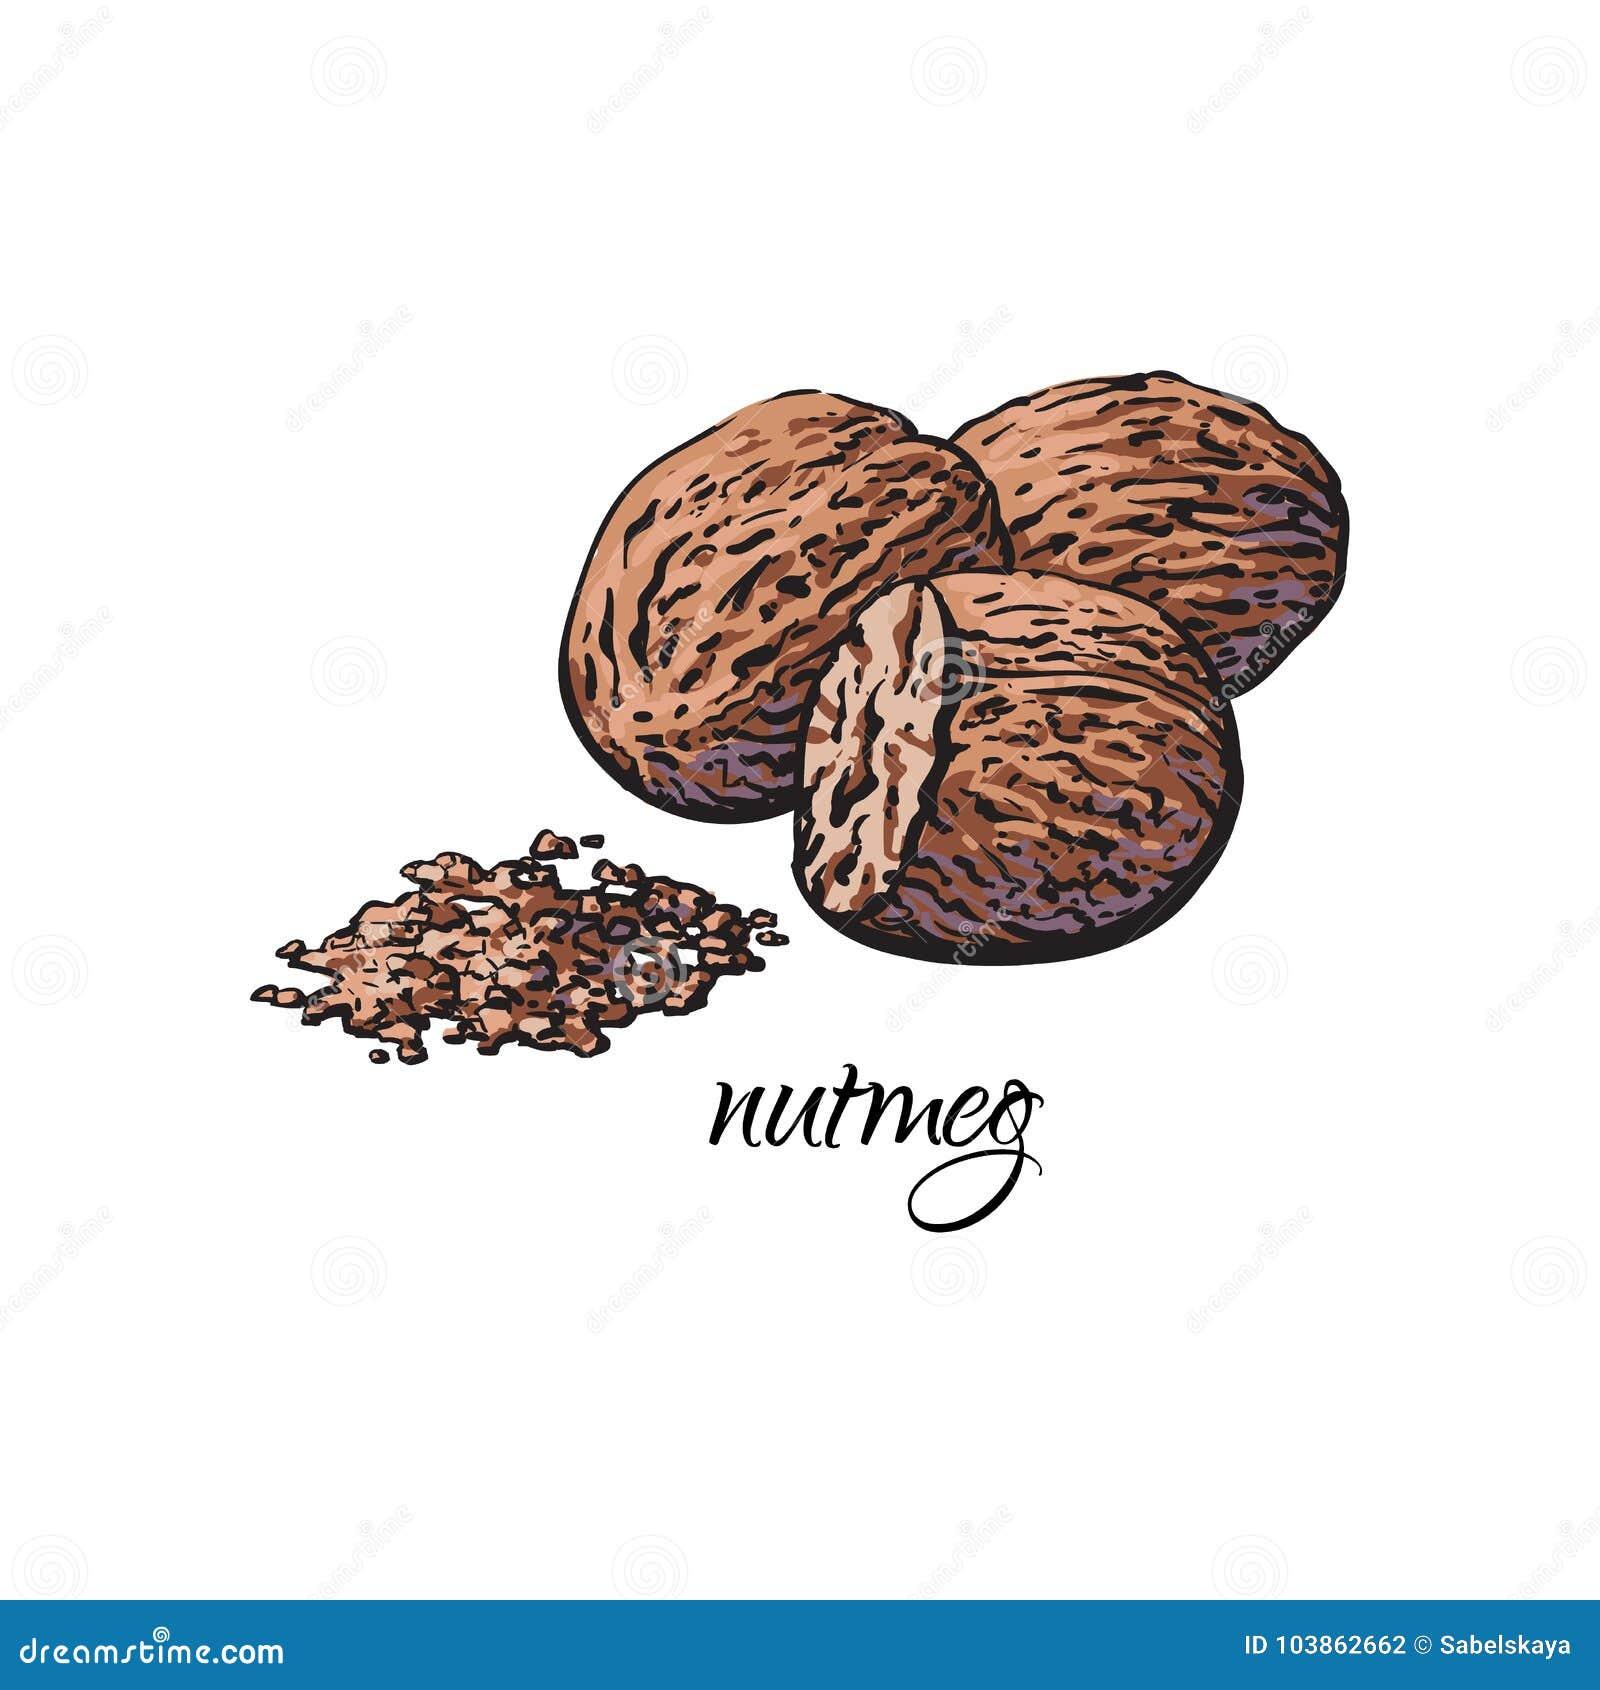 Whole and ground fragrant nutmeg with caption